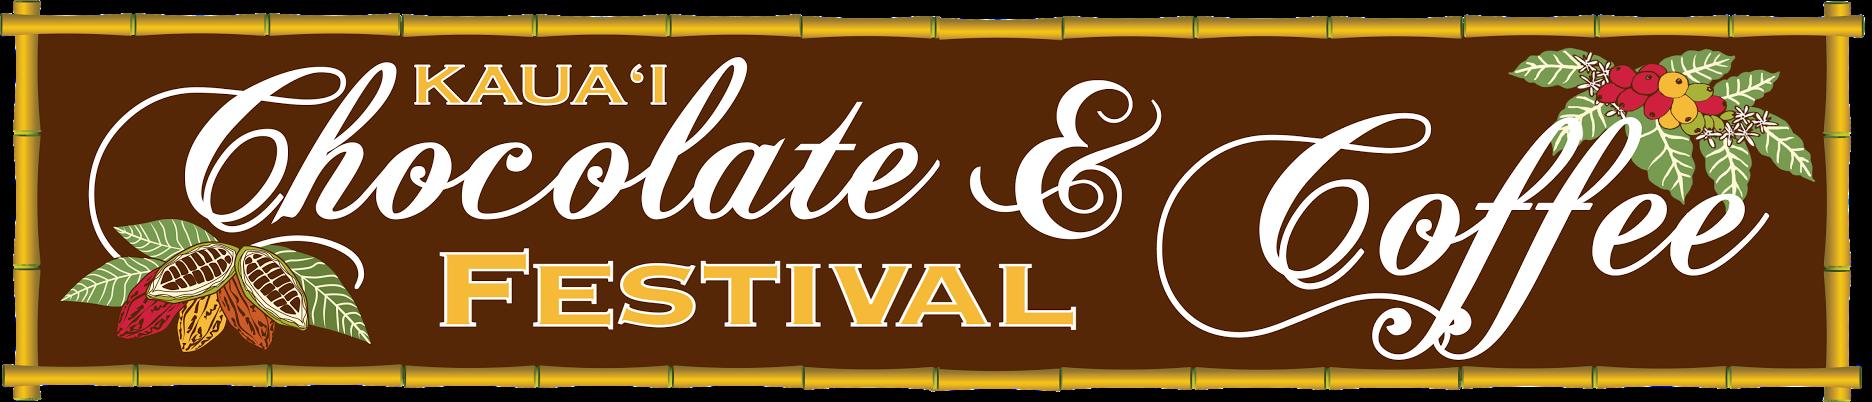 Kauai Chocolate & Coffee Festival logo